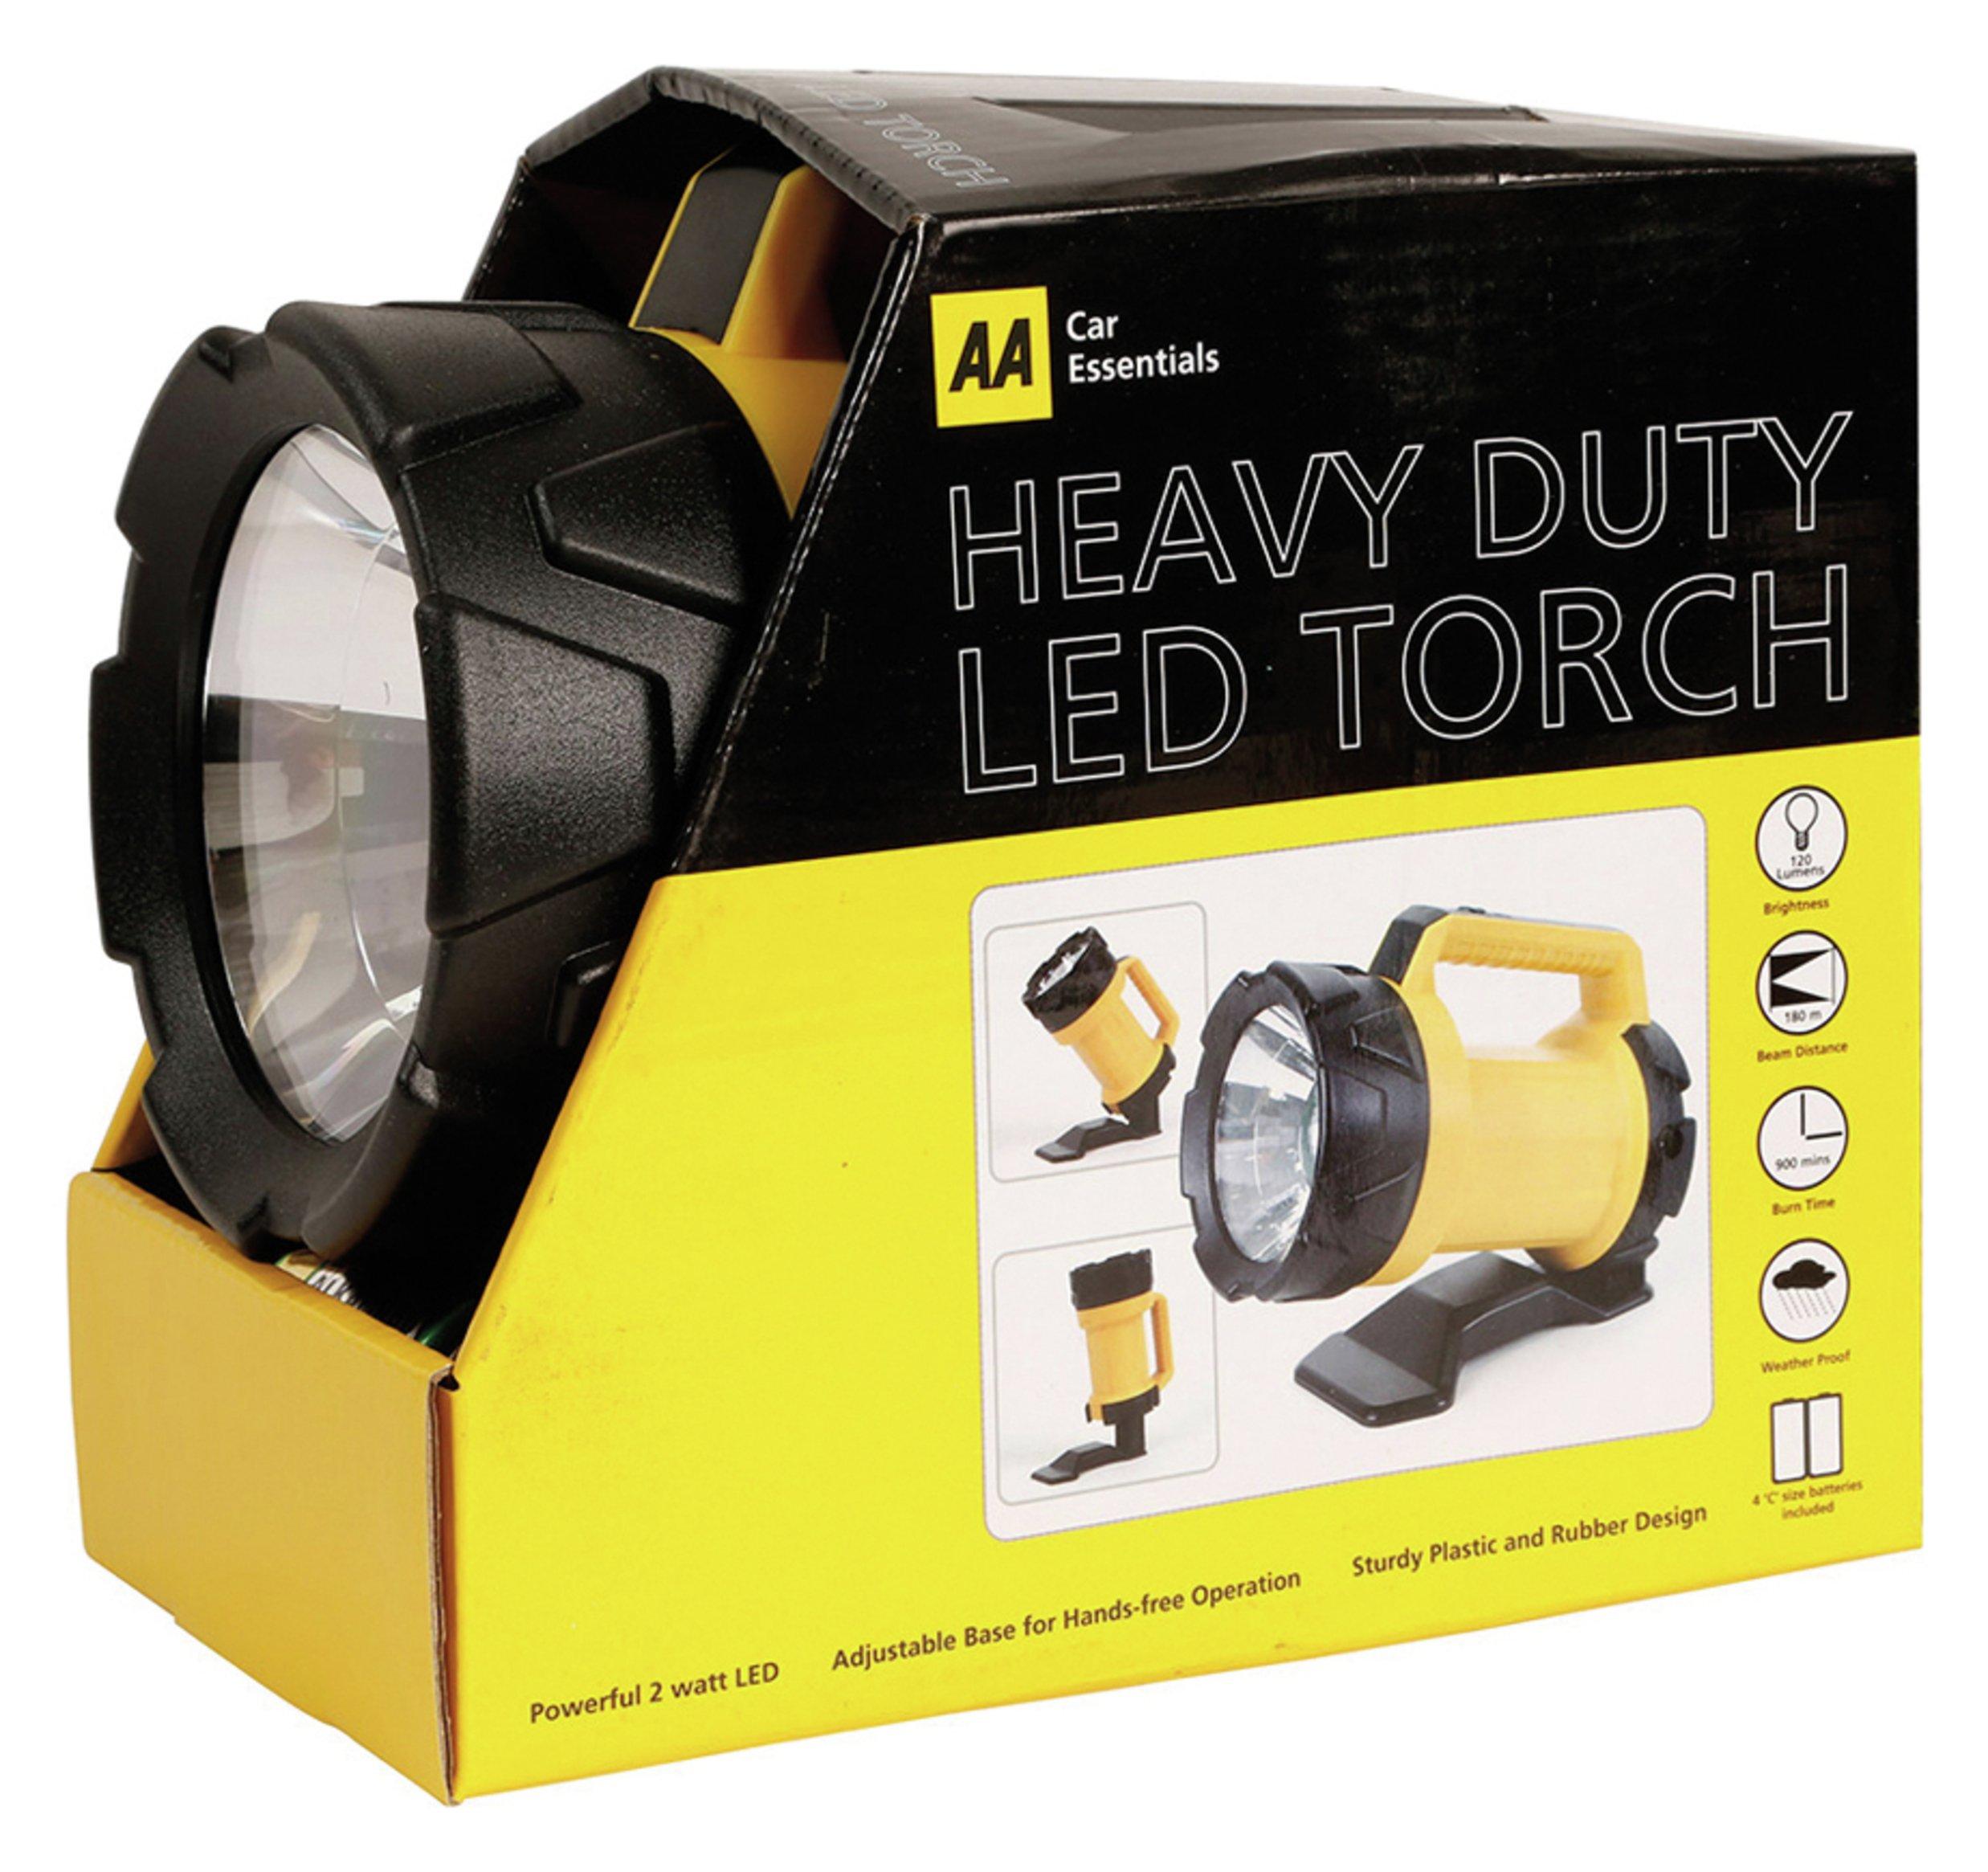 Image of AA Heavy Duty LED Torch